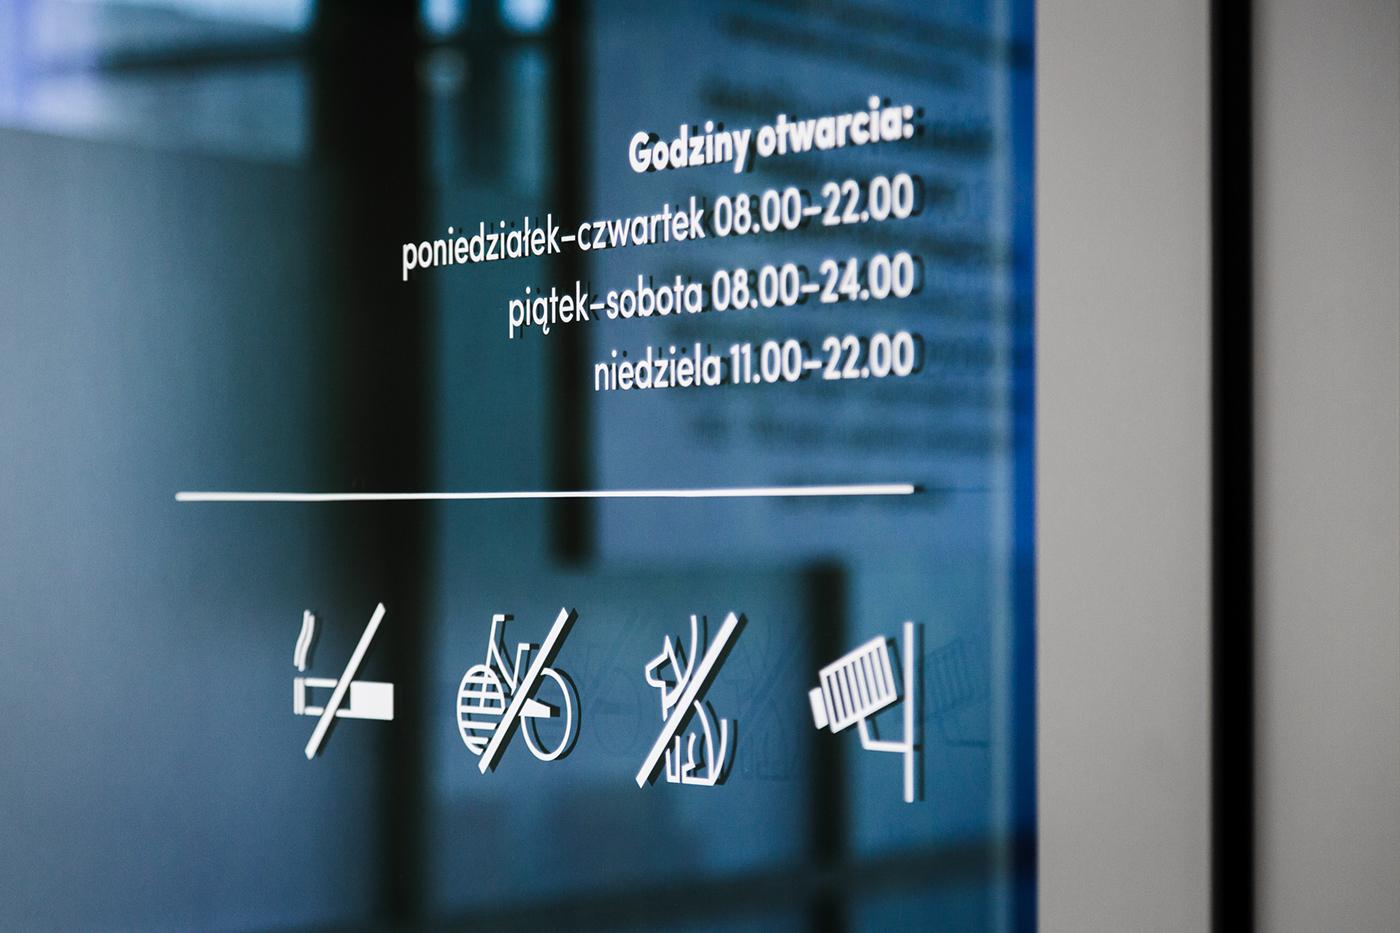 Mediateka图书馆导视系统设计© Blank Studio